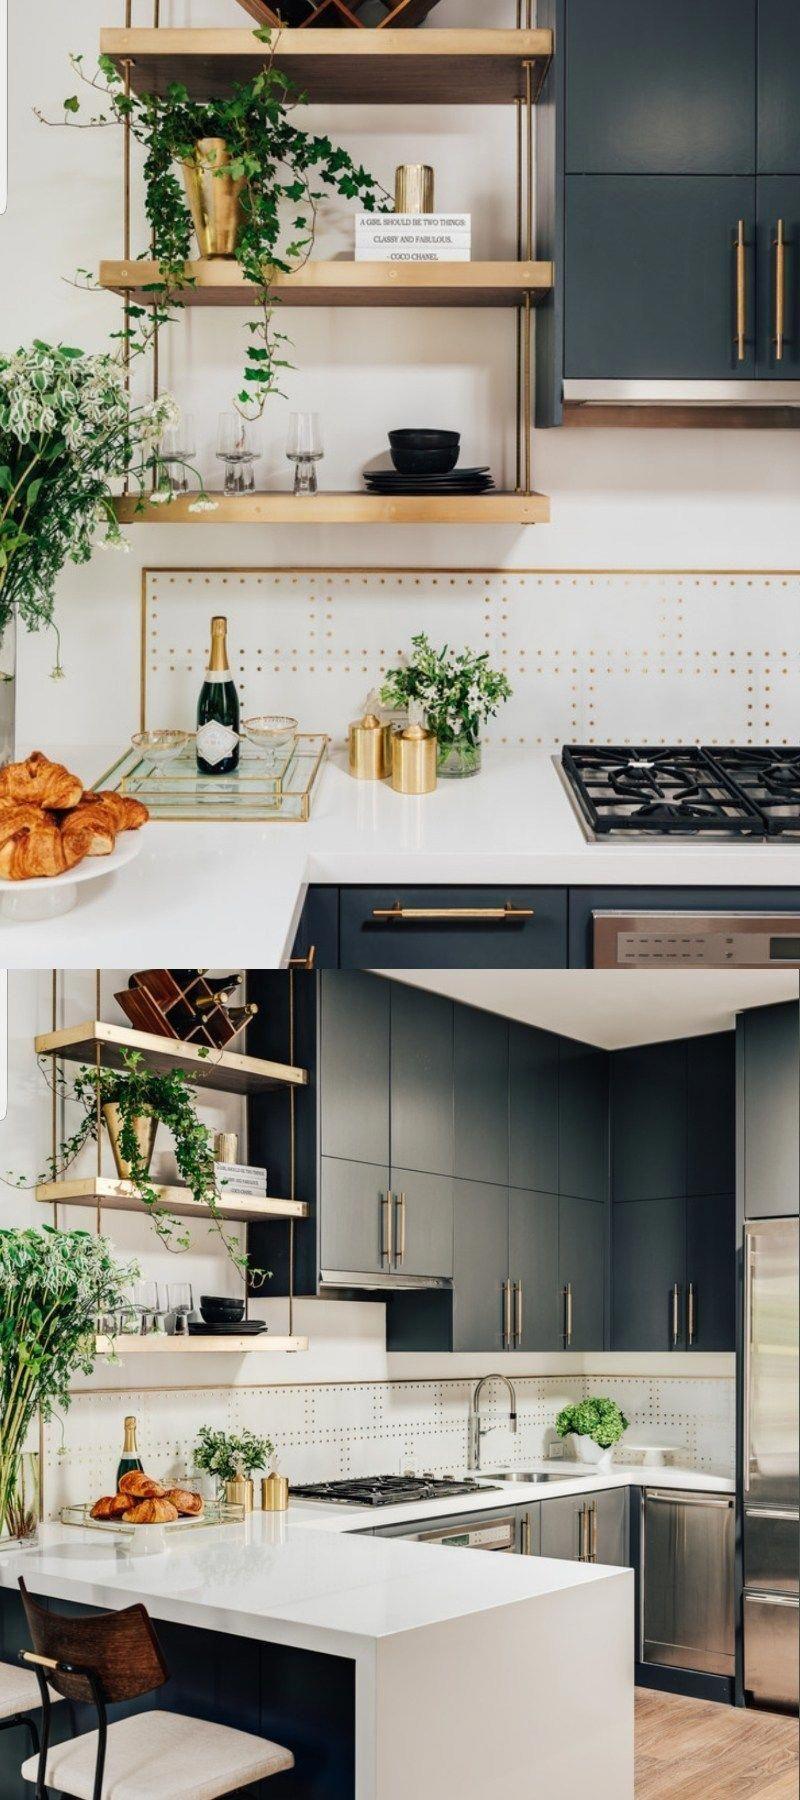 small u shaped kitchen ideas pro cons tips on designing u shaped kitchen withbre small on u kitchen ideas small id=60555